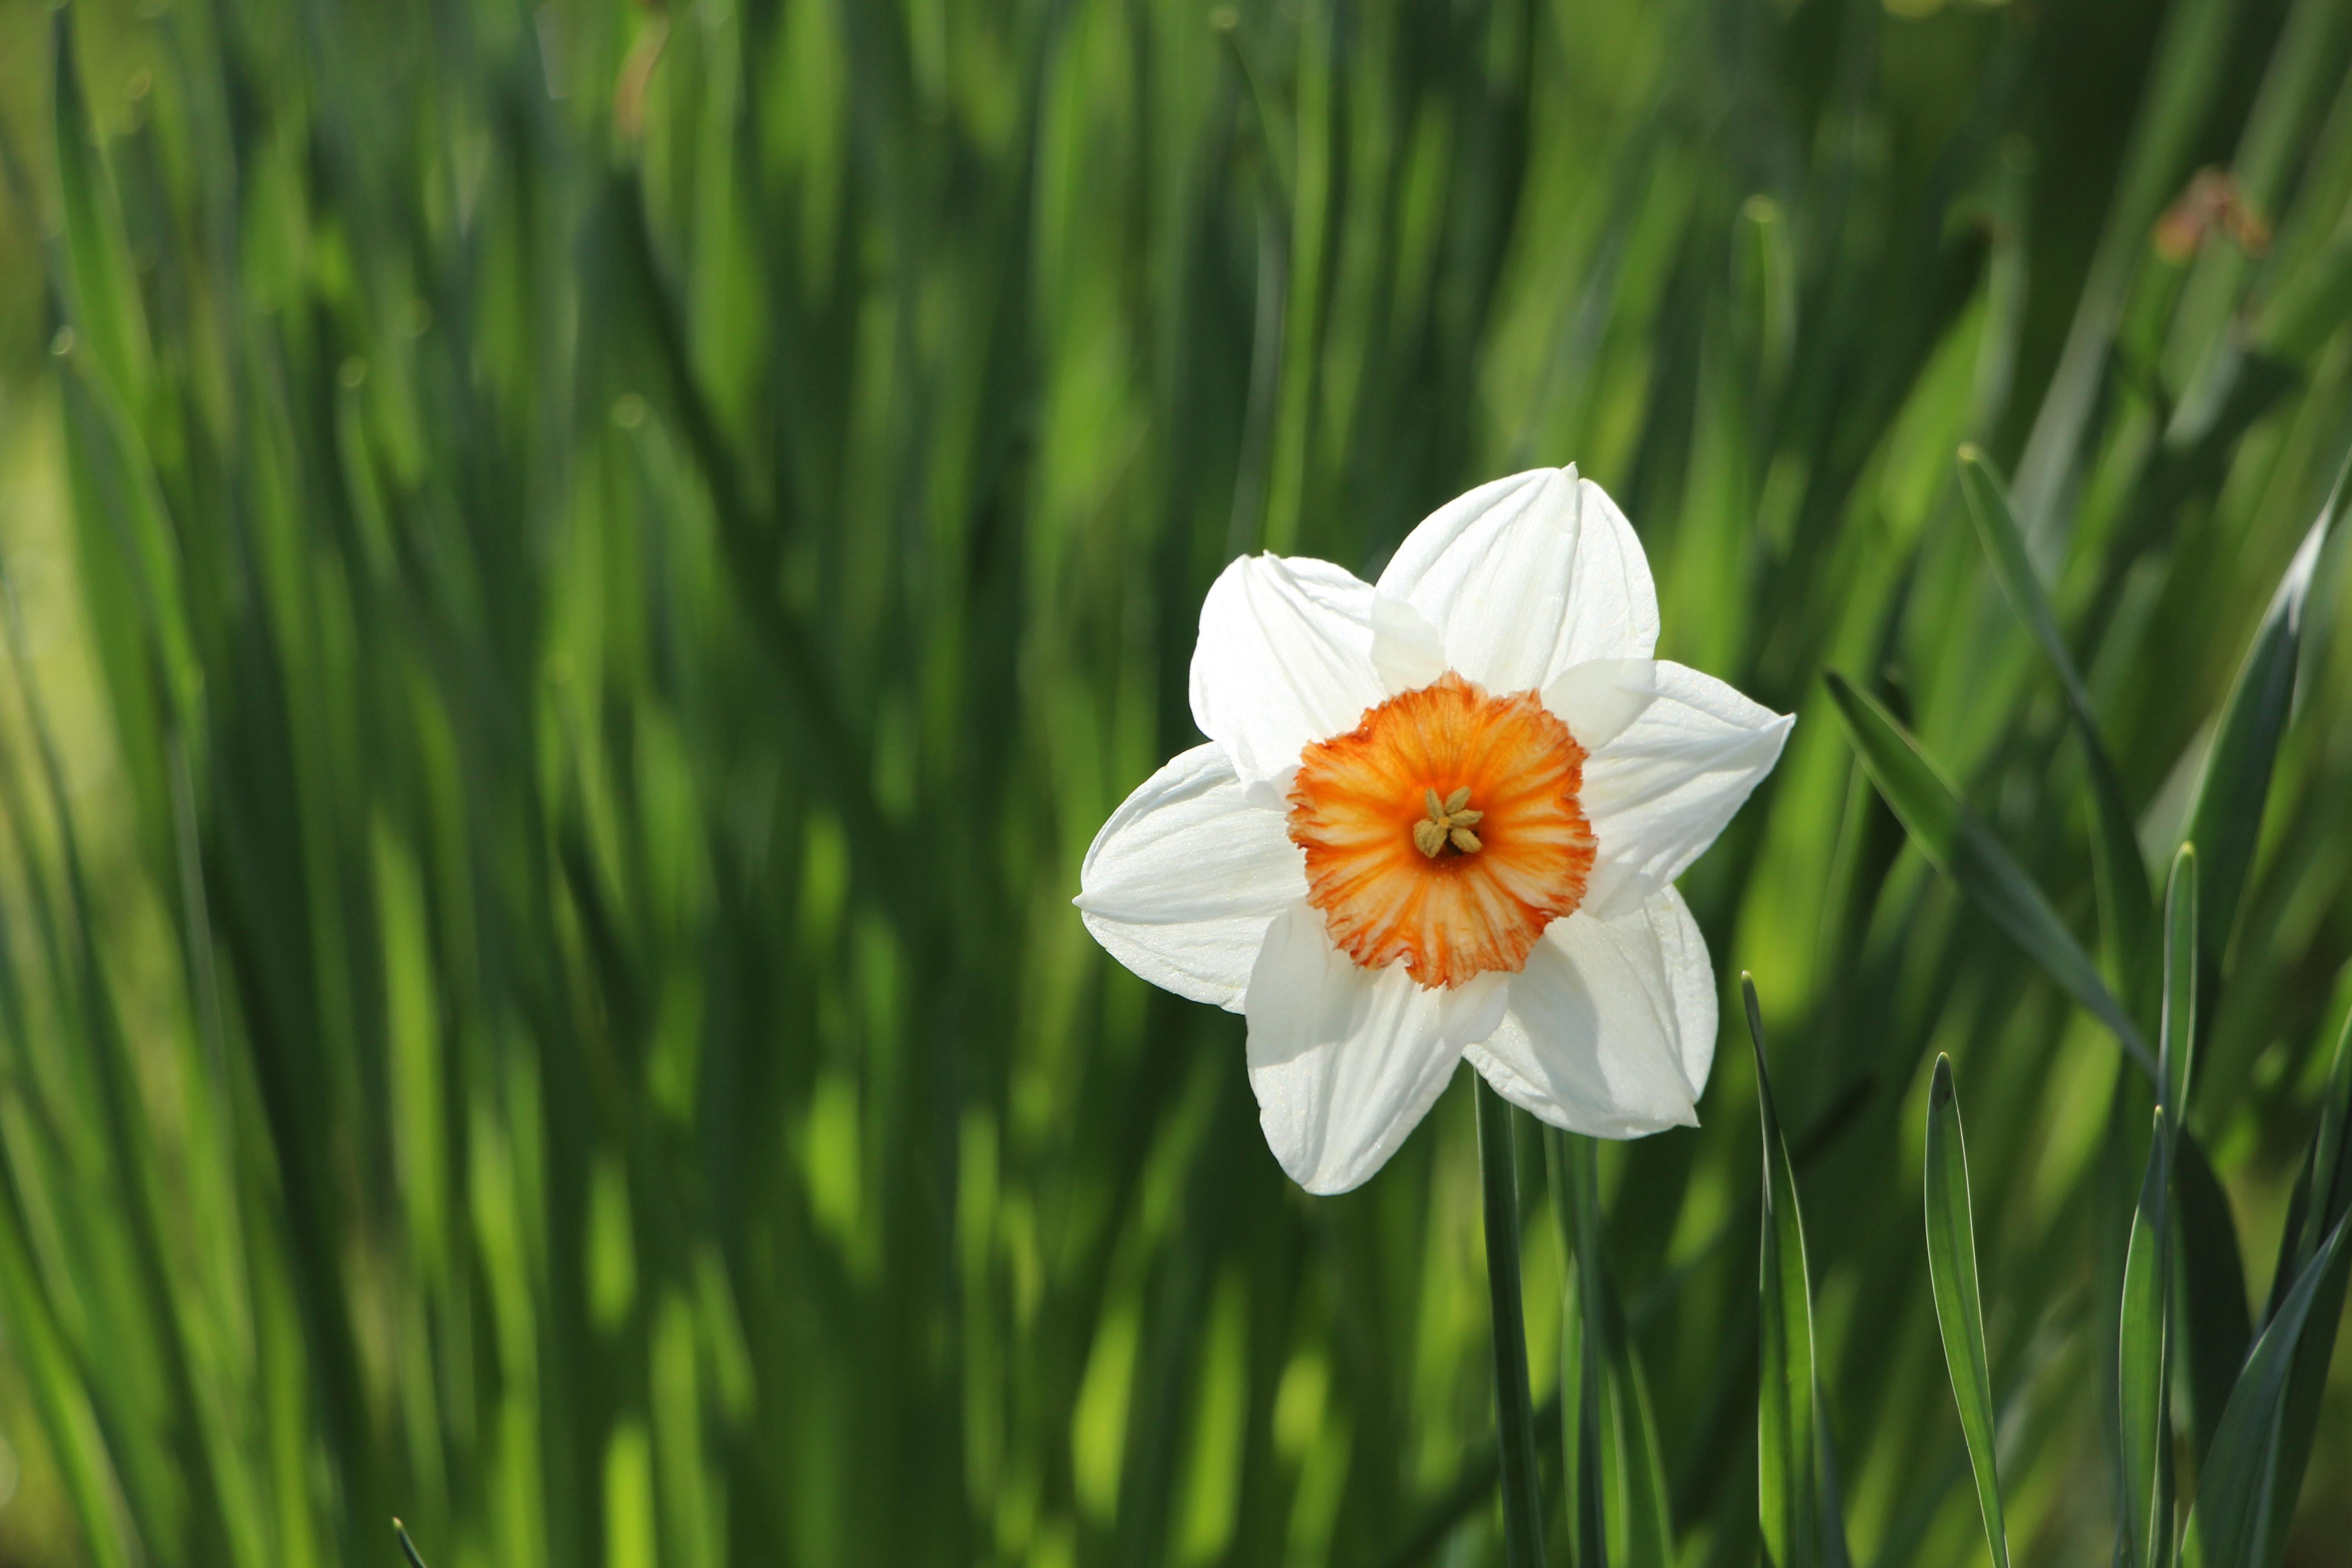 Single white daffodil in green grass in Spring, Dublin